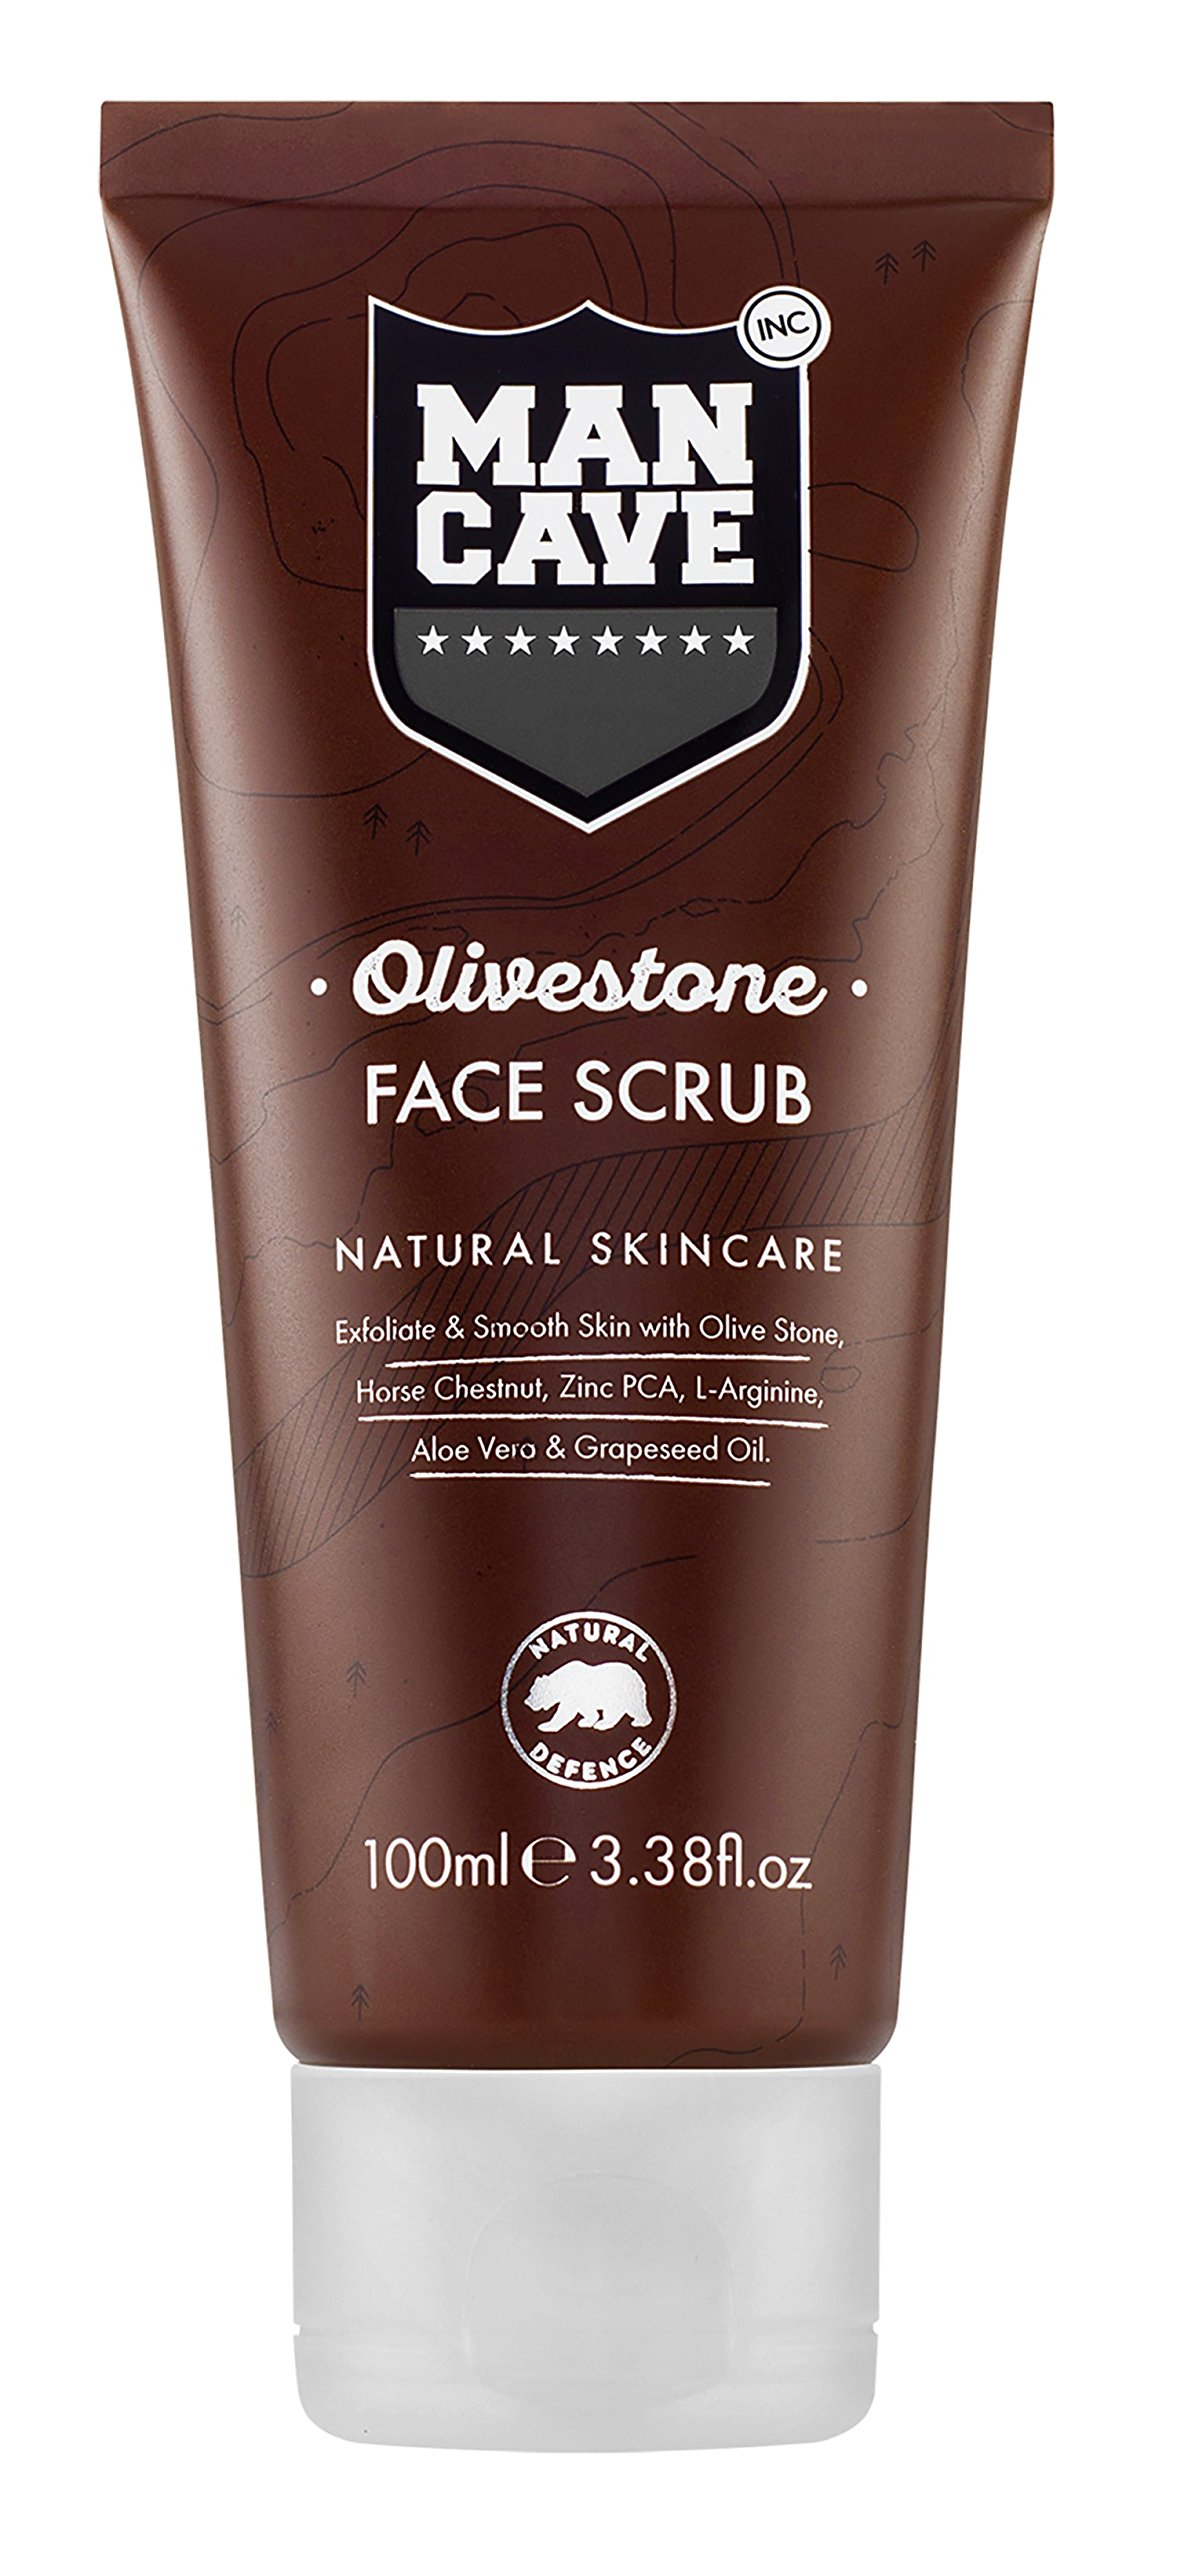 ManCave Olivestone Natural Skin Care Face Scrub, 3.38 Oz [ Secret Key ] The Premium Snow White Toning Cream 50ml